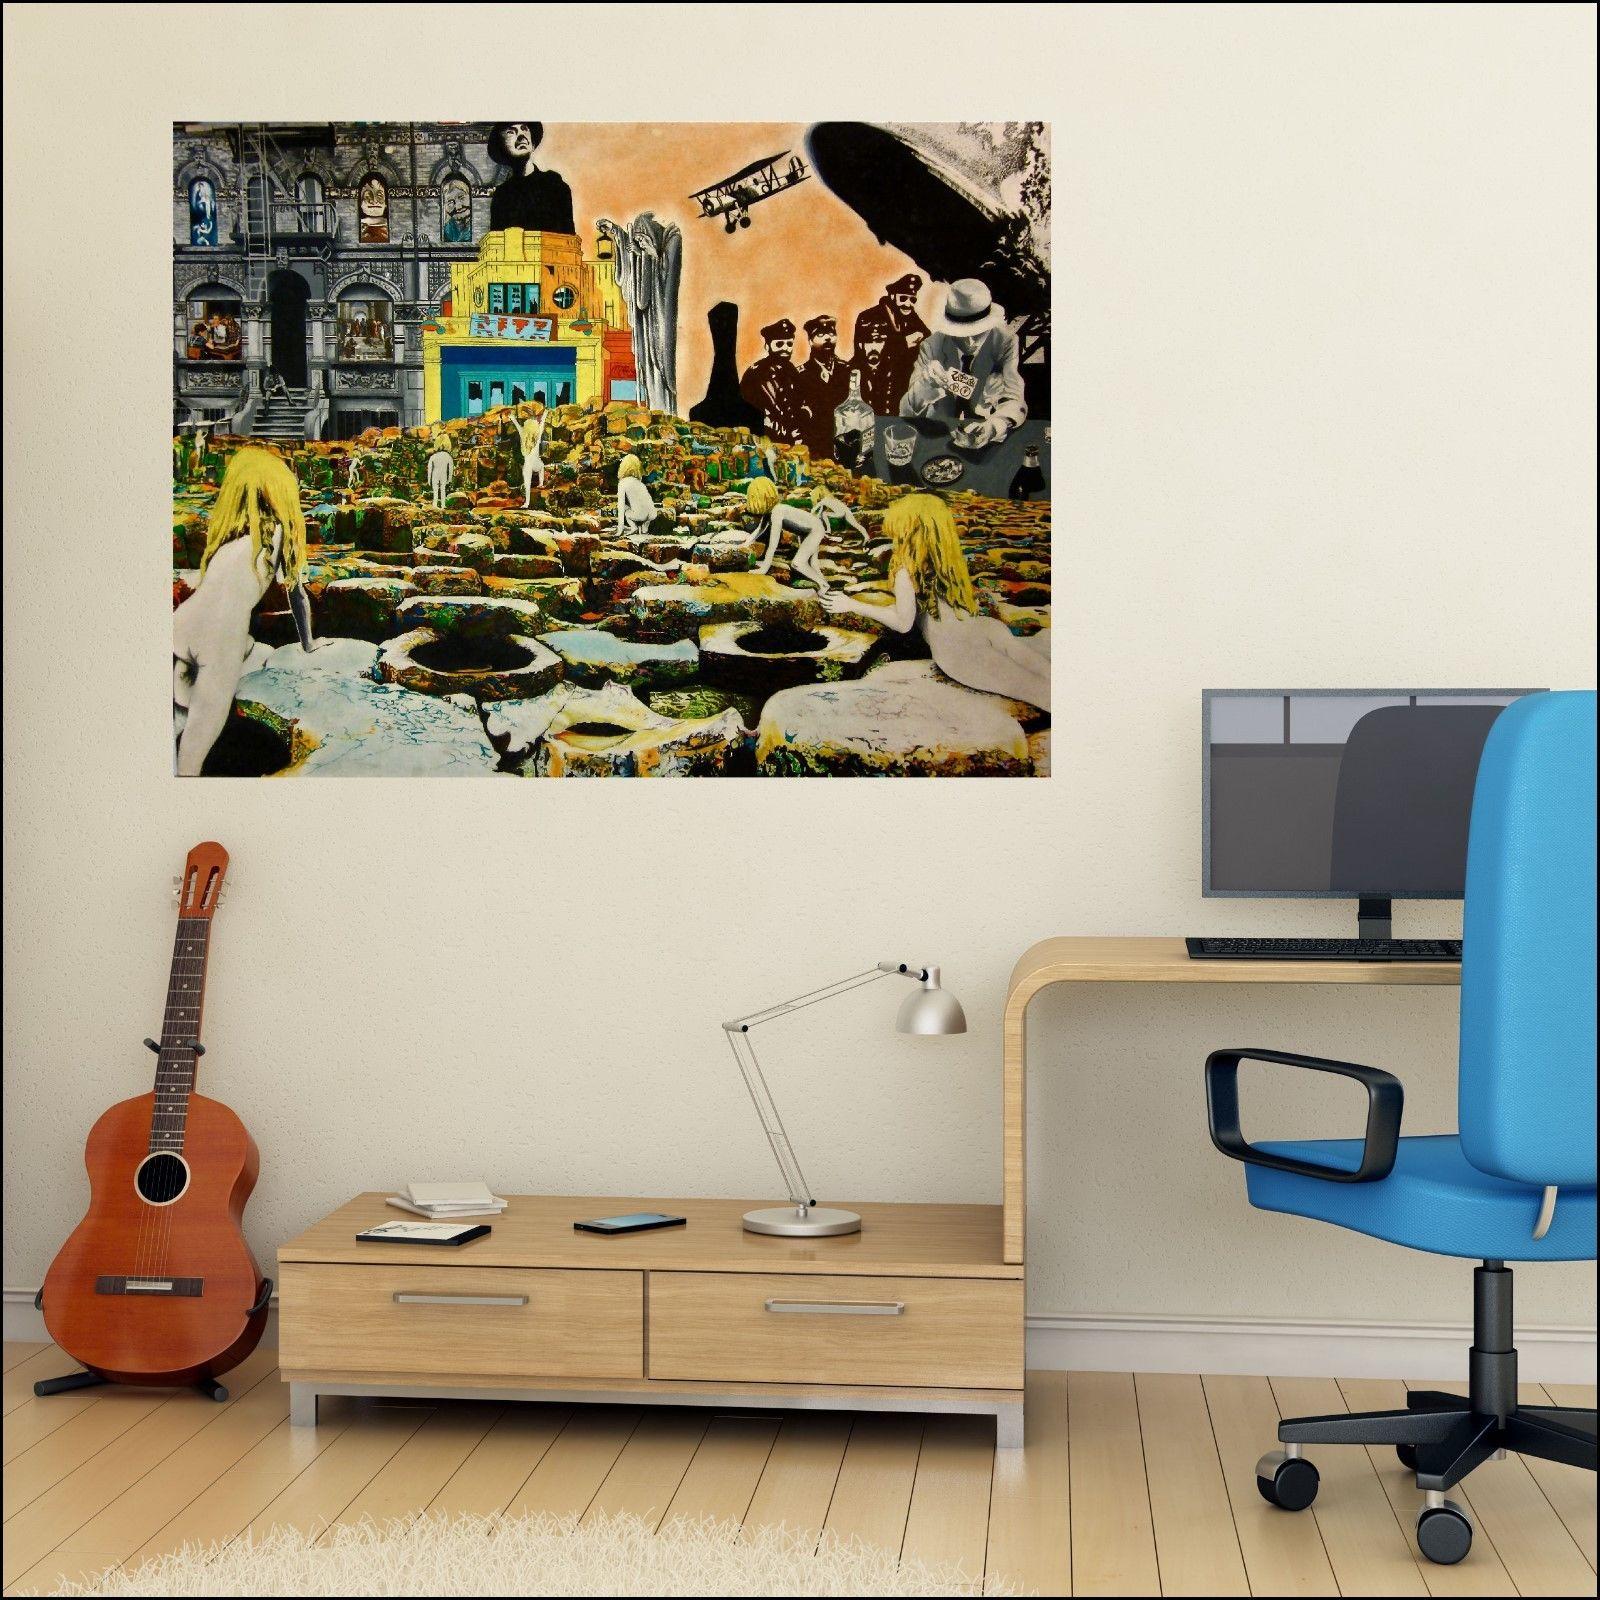 Led zepplin vinyl album art wall sticker man cave mural 7 for Decor mural xxl